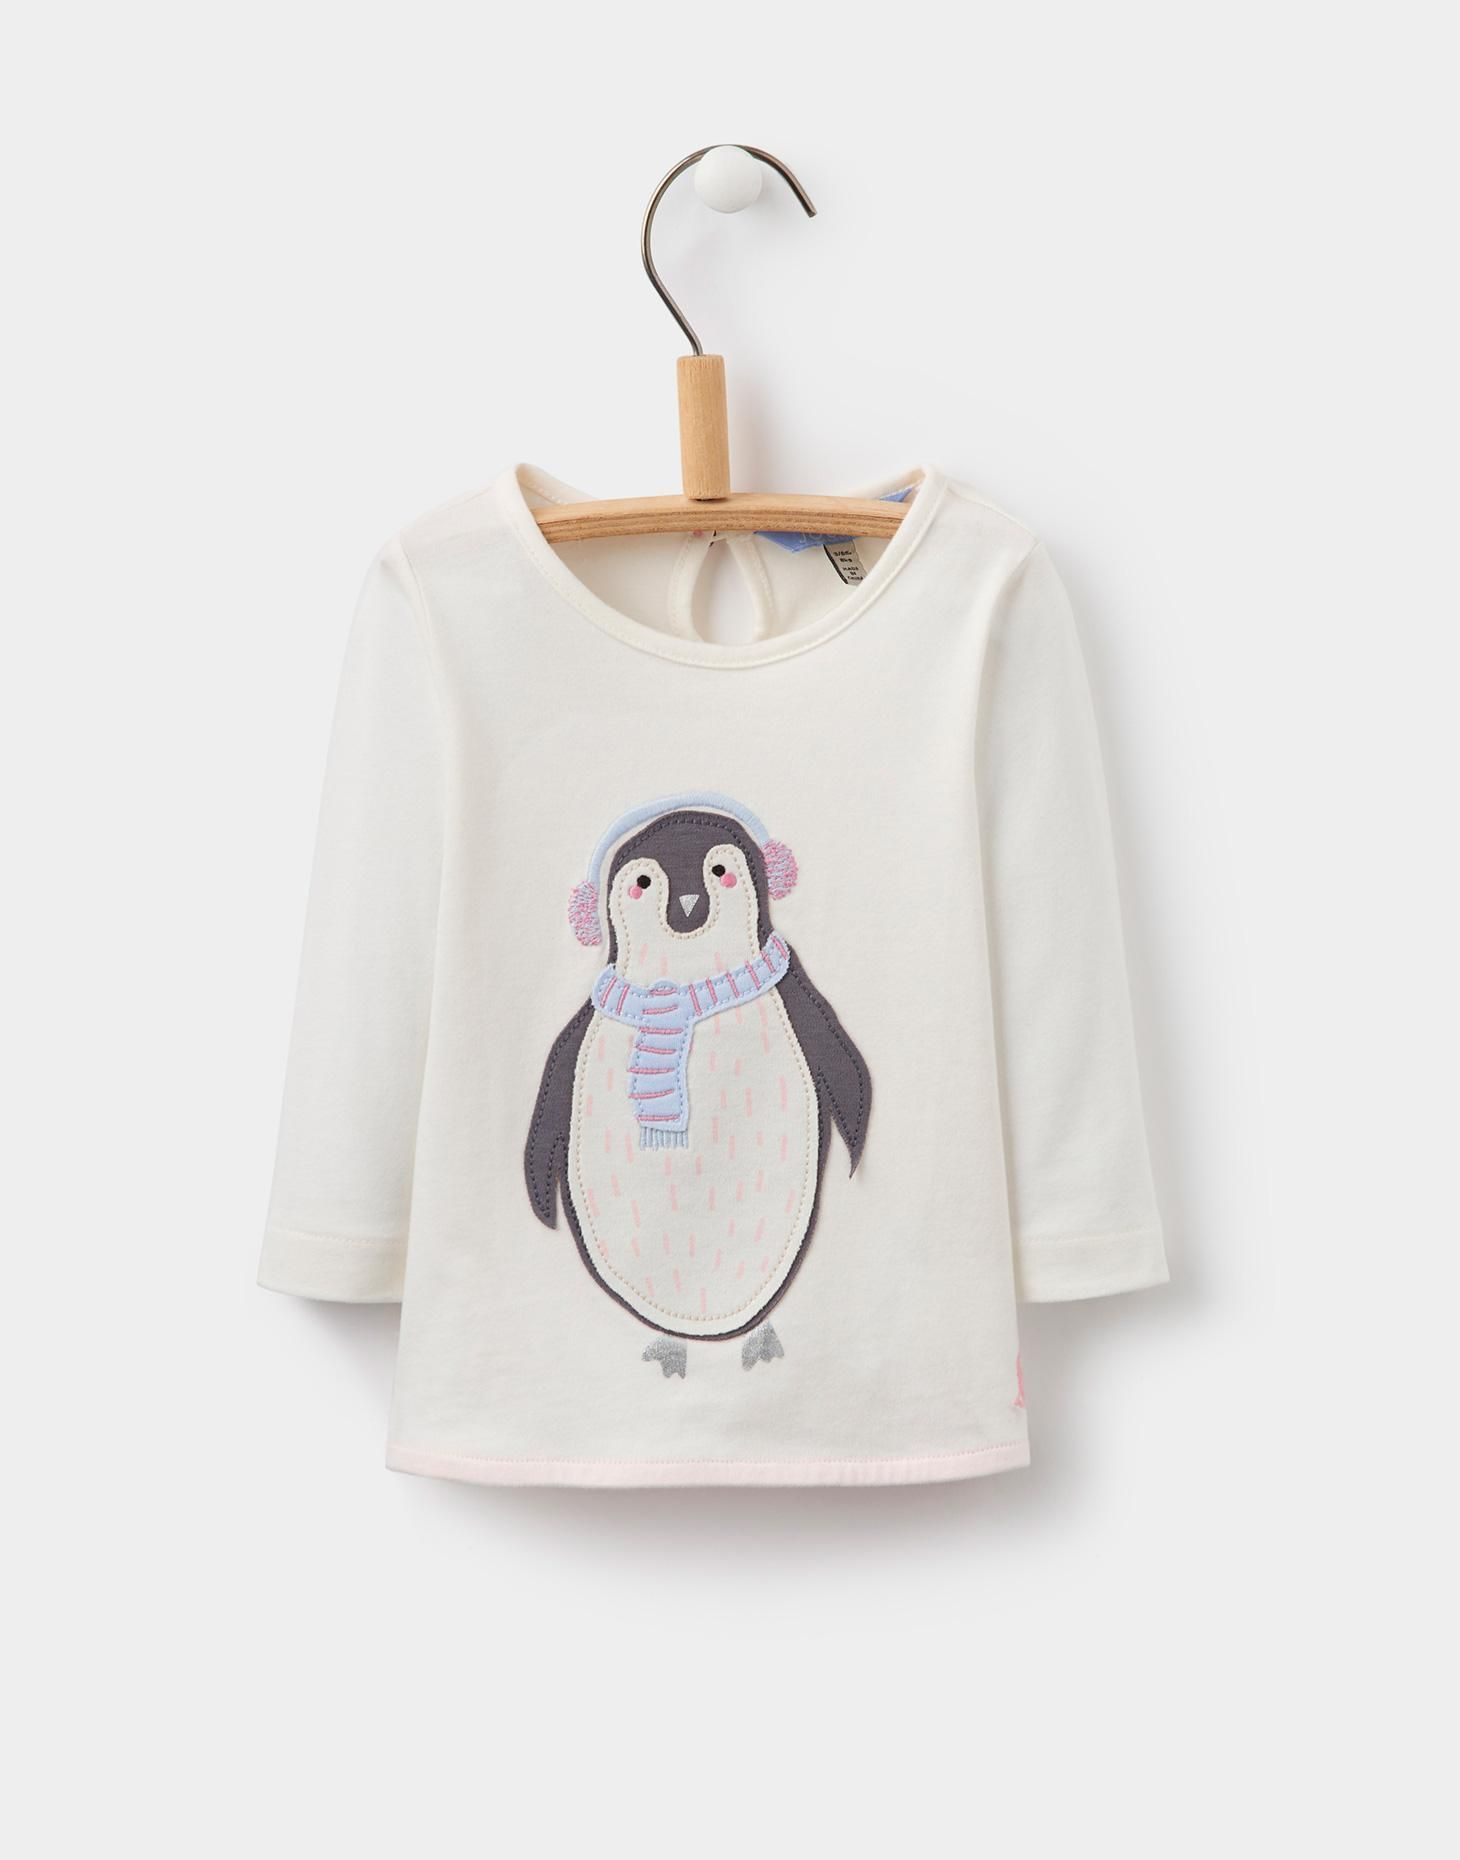 Ava penguin applique jersey tshirt joules us shirts